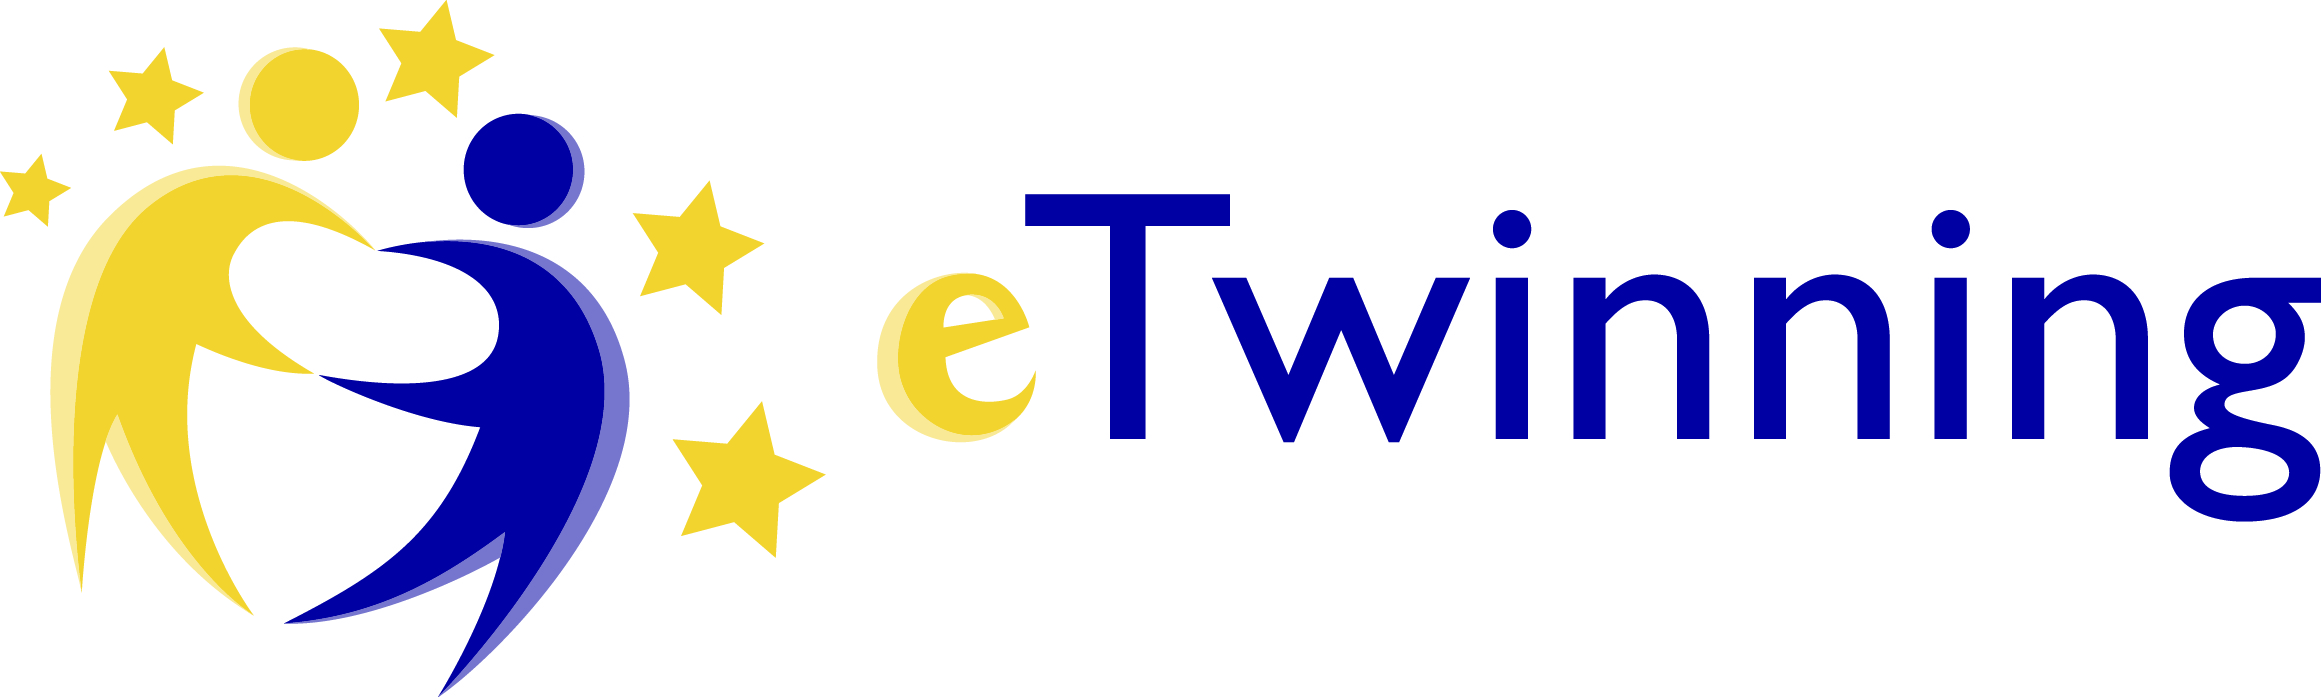 logotip eTwinning horizontalni